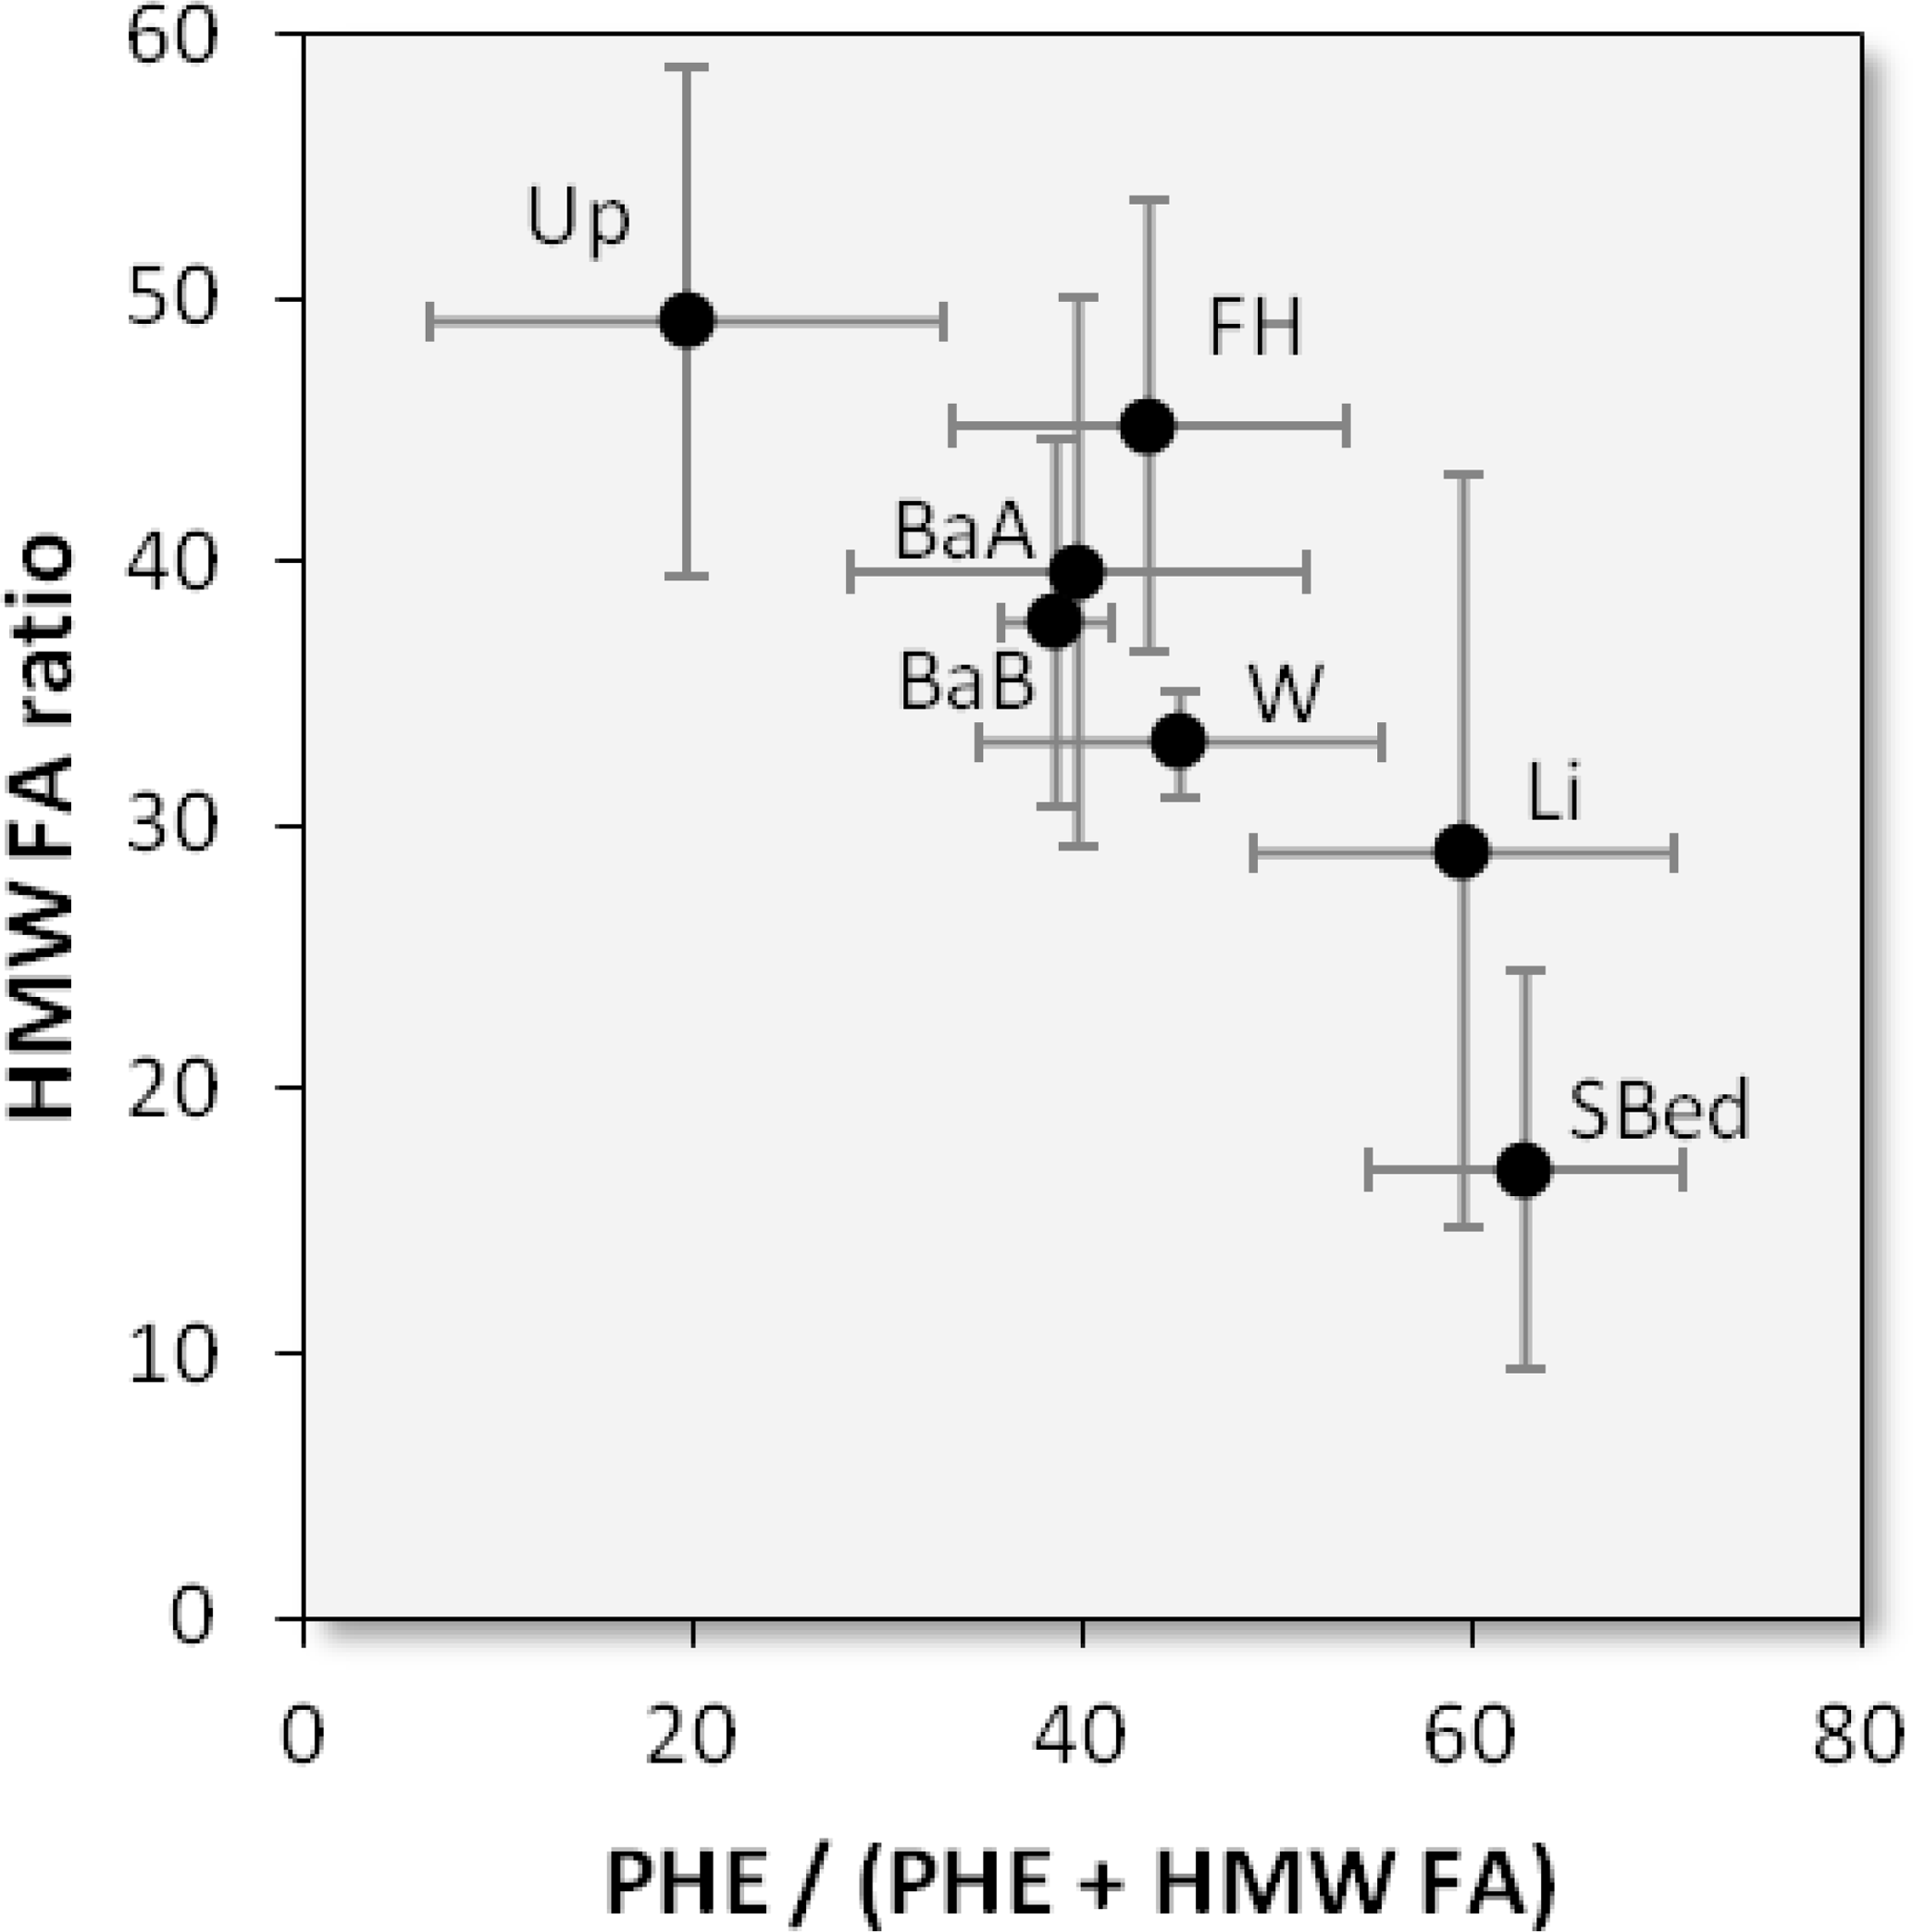 Pca To Determine Marshall Mg Cab Wiring Diagram